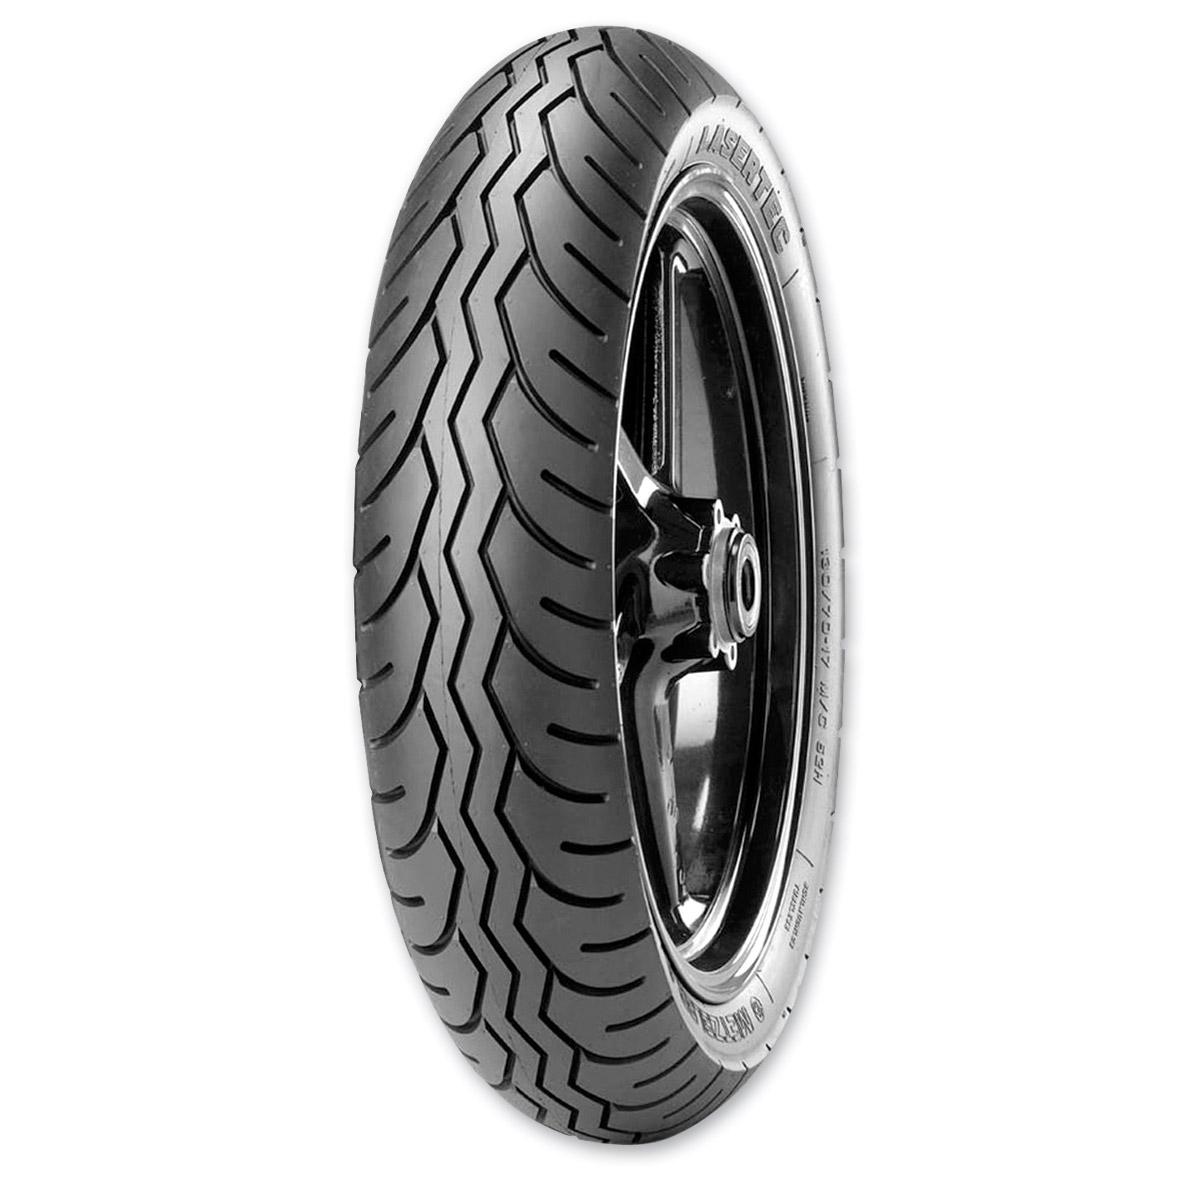 Metzeler Lasertec 130/80-17 Rear Tire